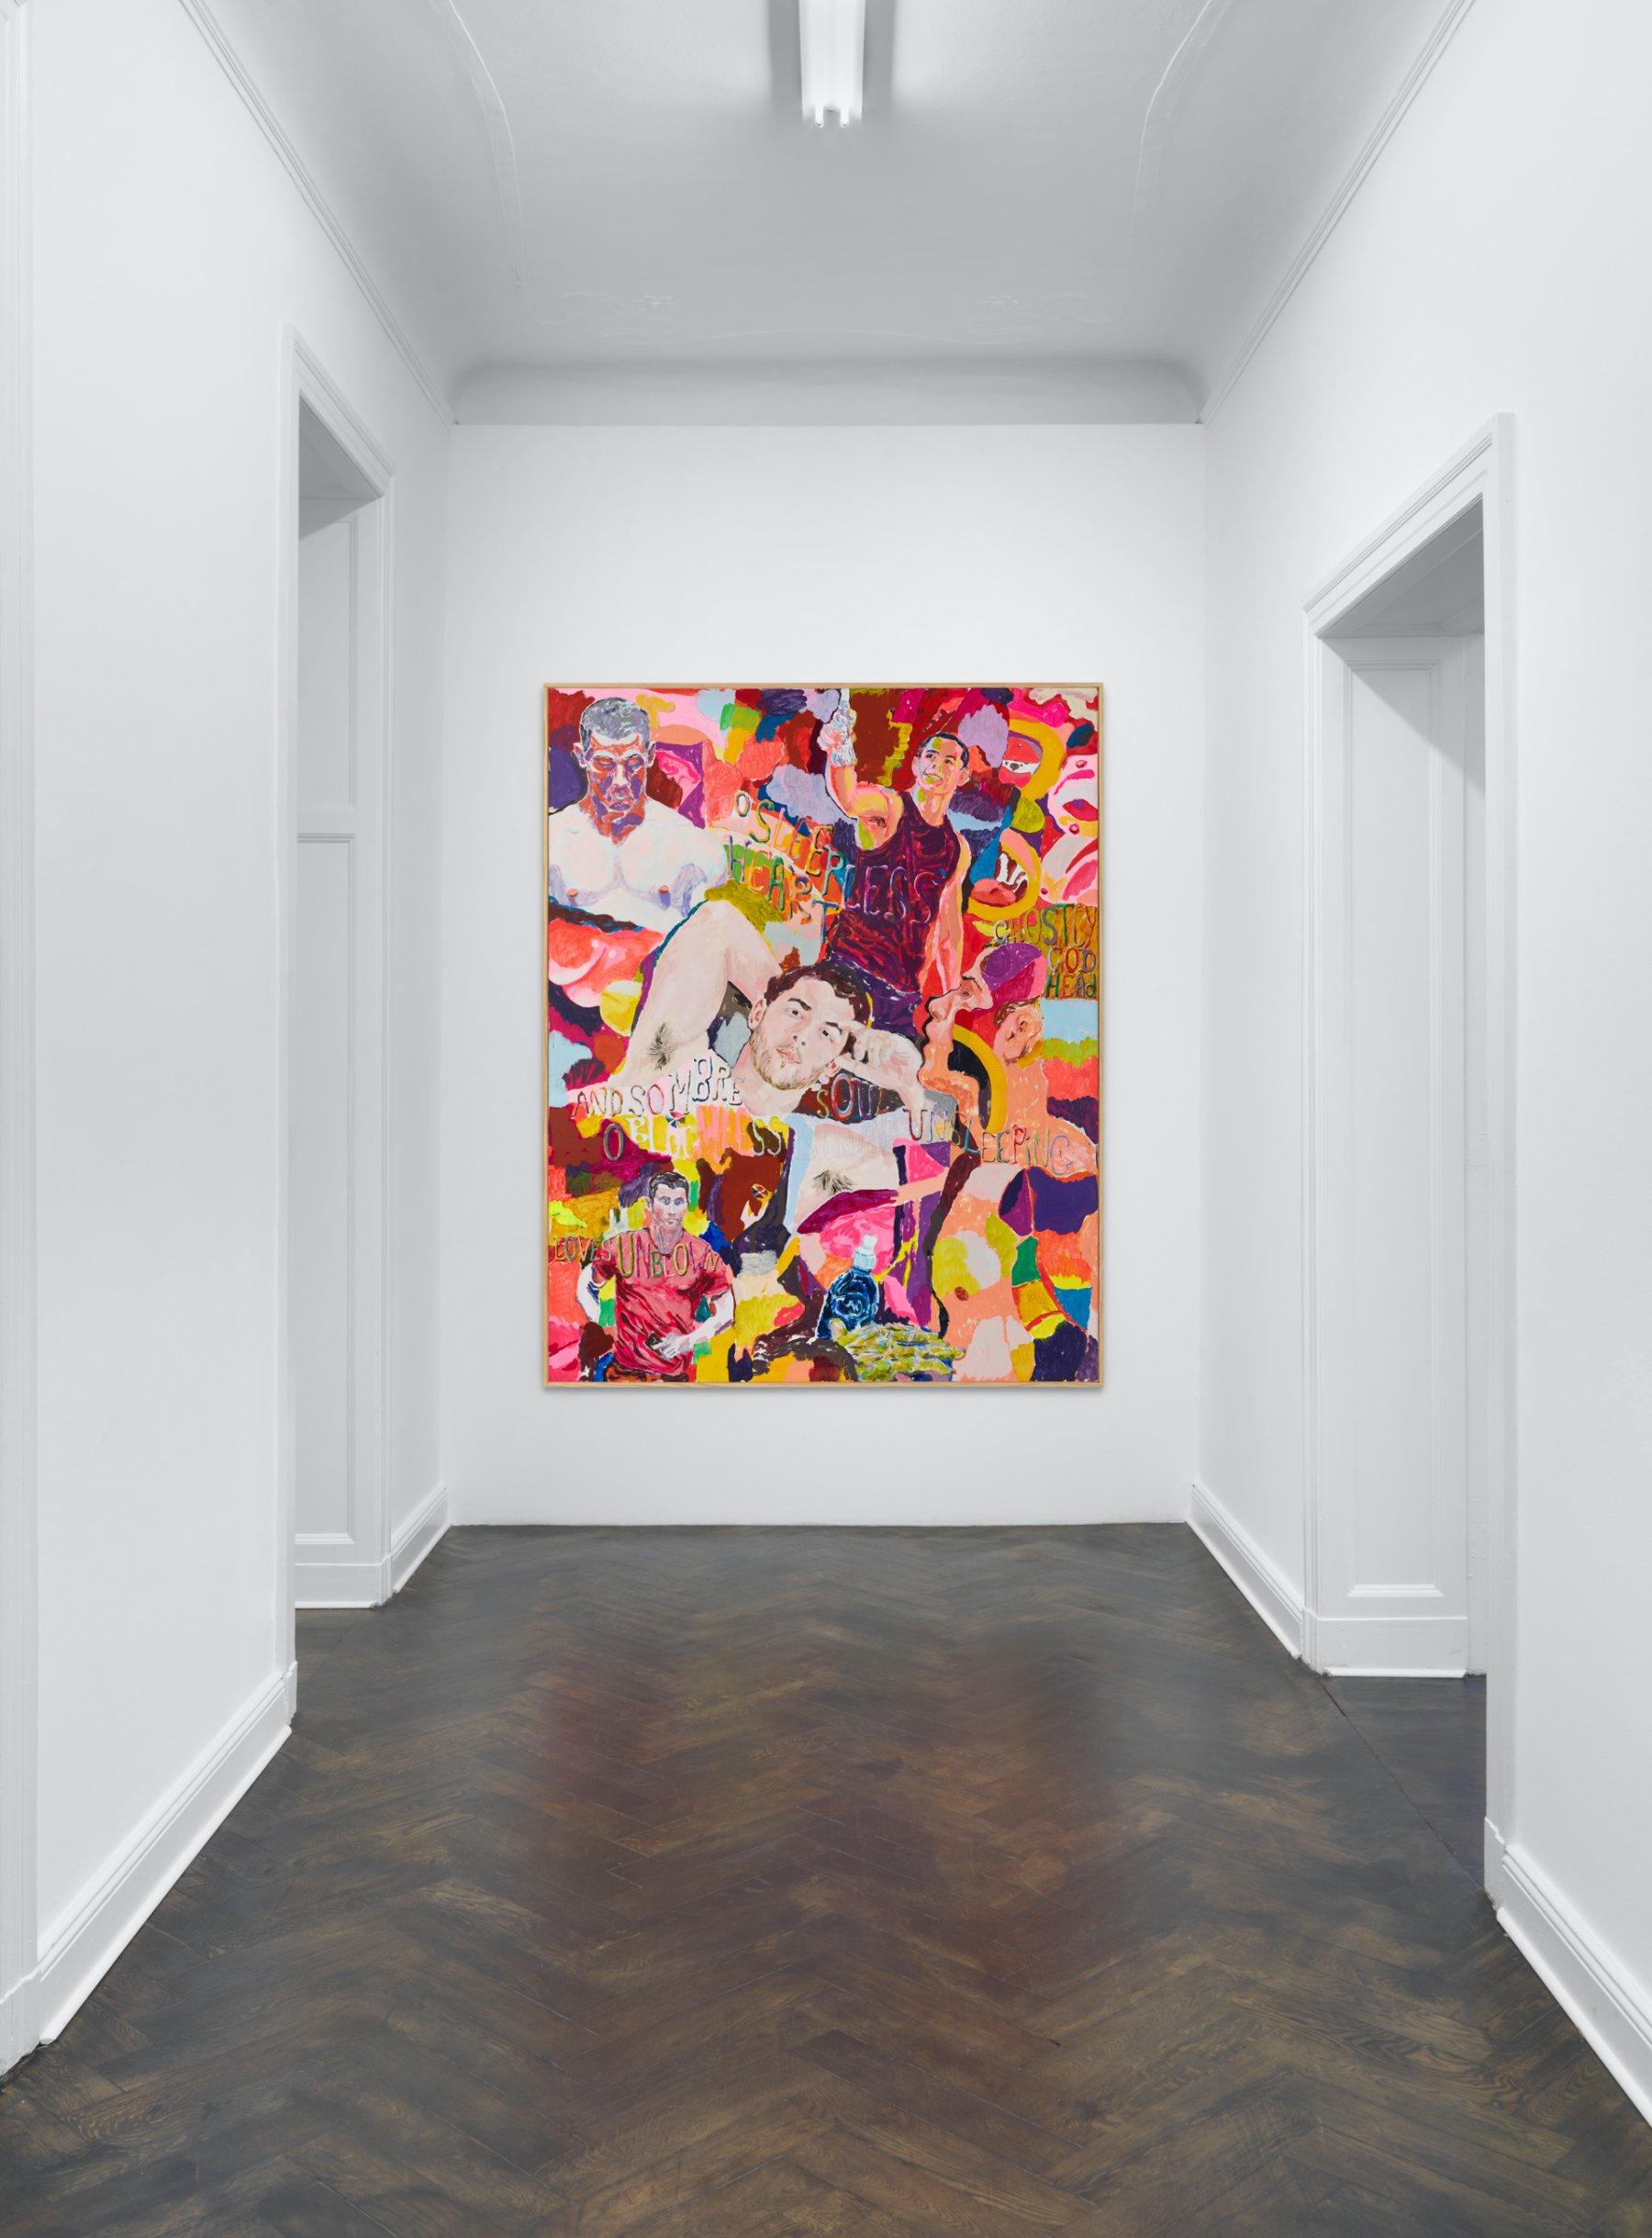 Galerie Buchholz Berlin Richard Hawkins 1